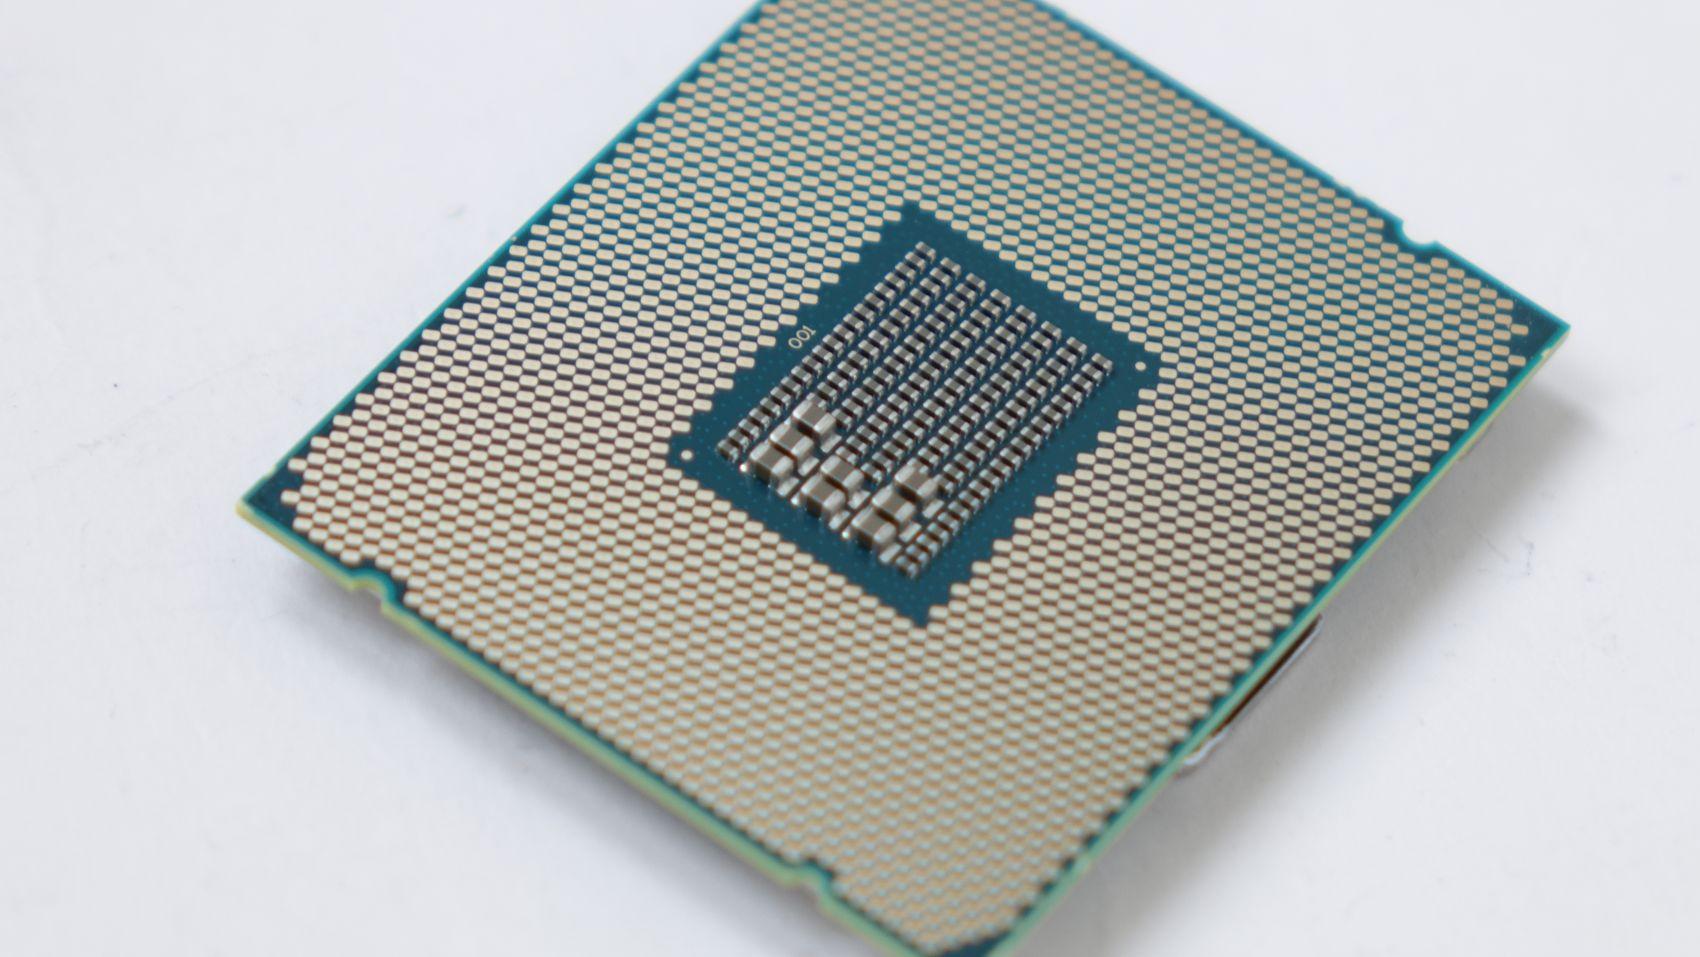 Intel Xeon E5-2620 v4 hero